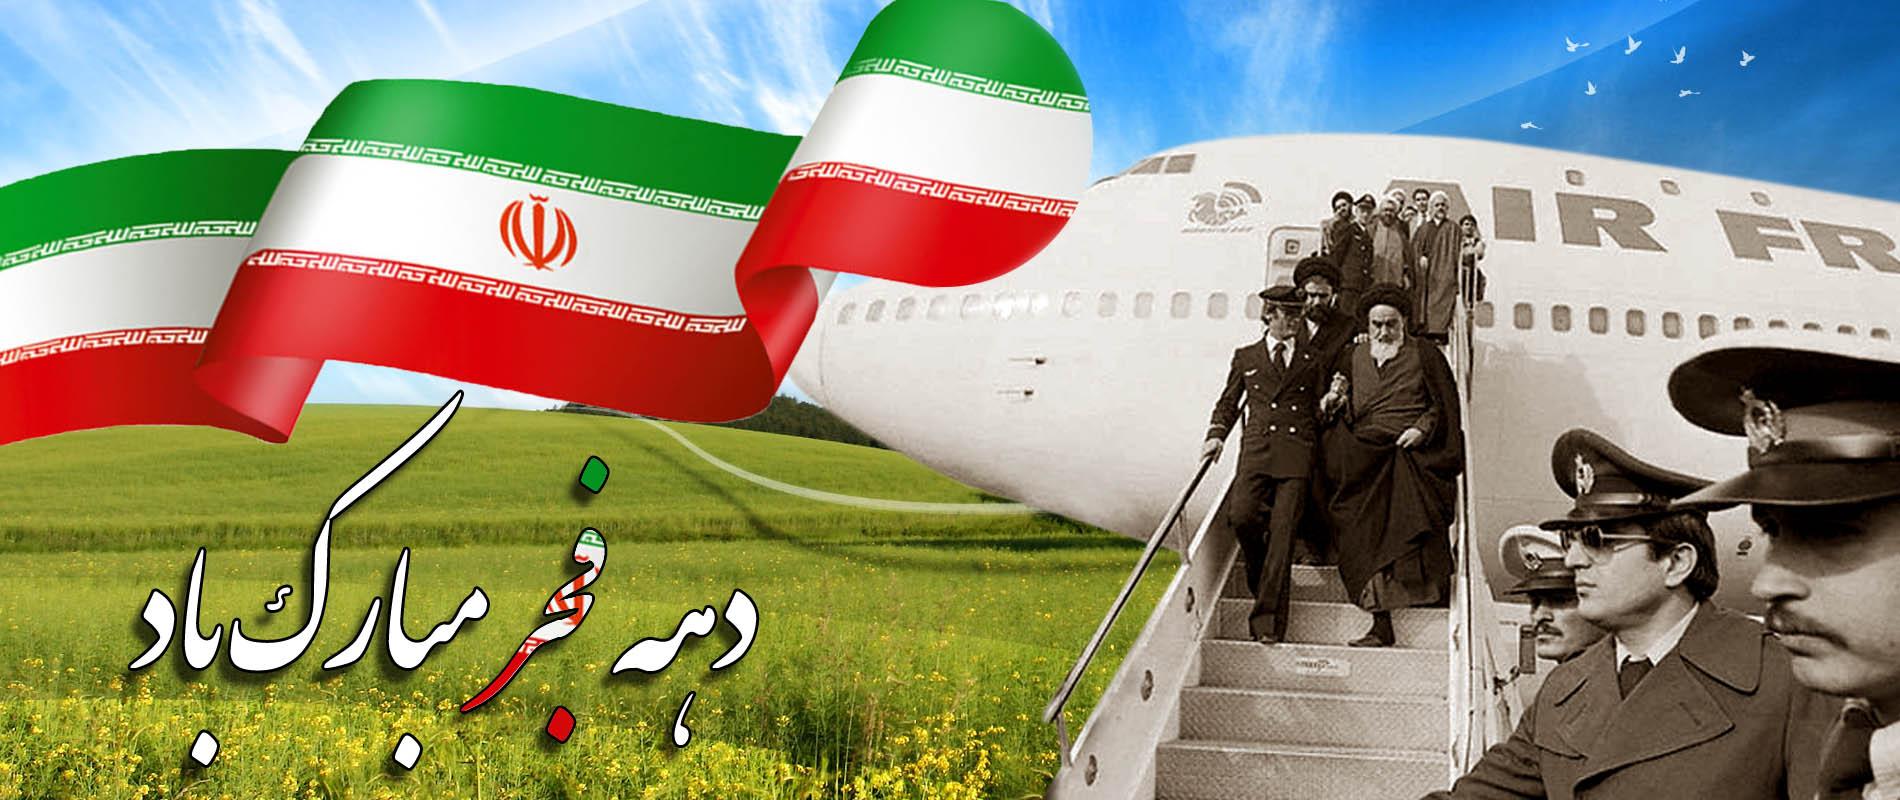 ایام الله دهه فجر انقلاب